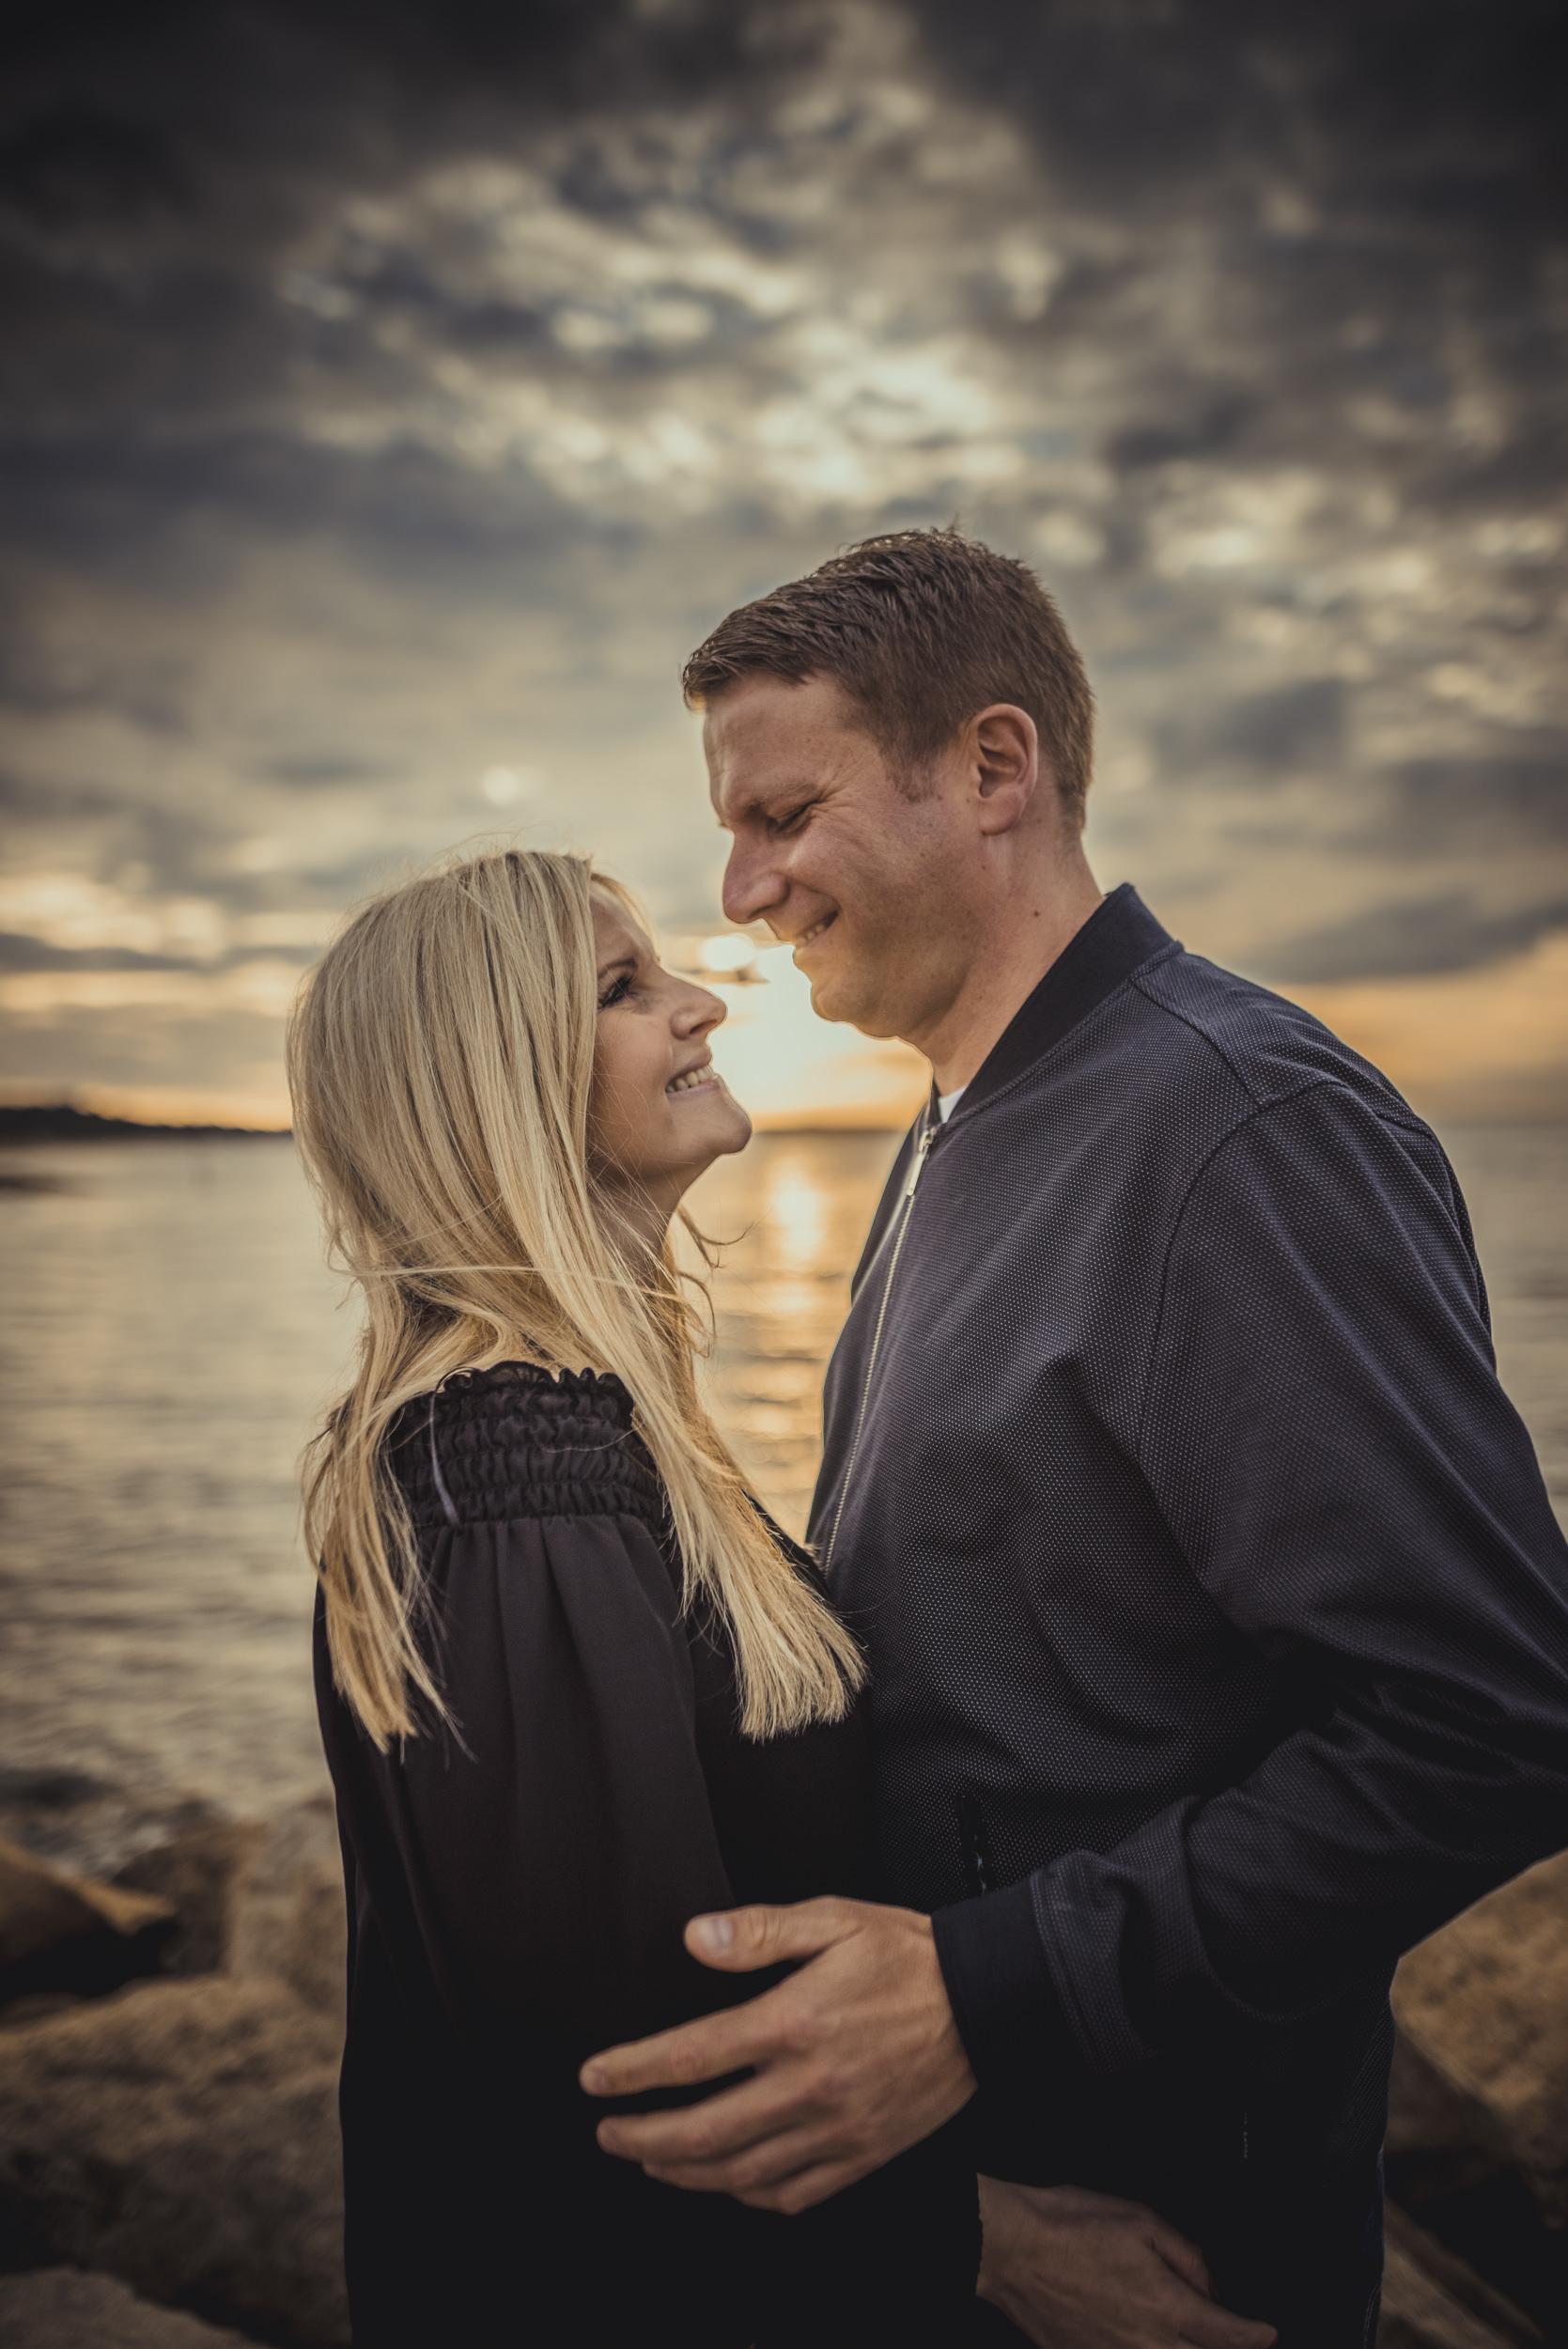 Trisha-and-Robert-Engagement-session-Sandbanks-beach-Poole-Manu-Mendoza-Wedding-Photography-048.jpg